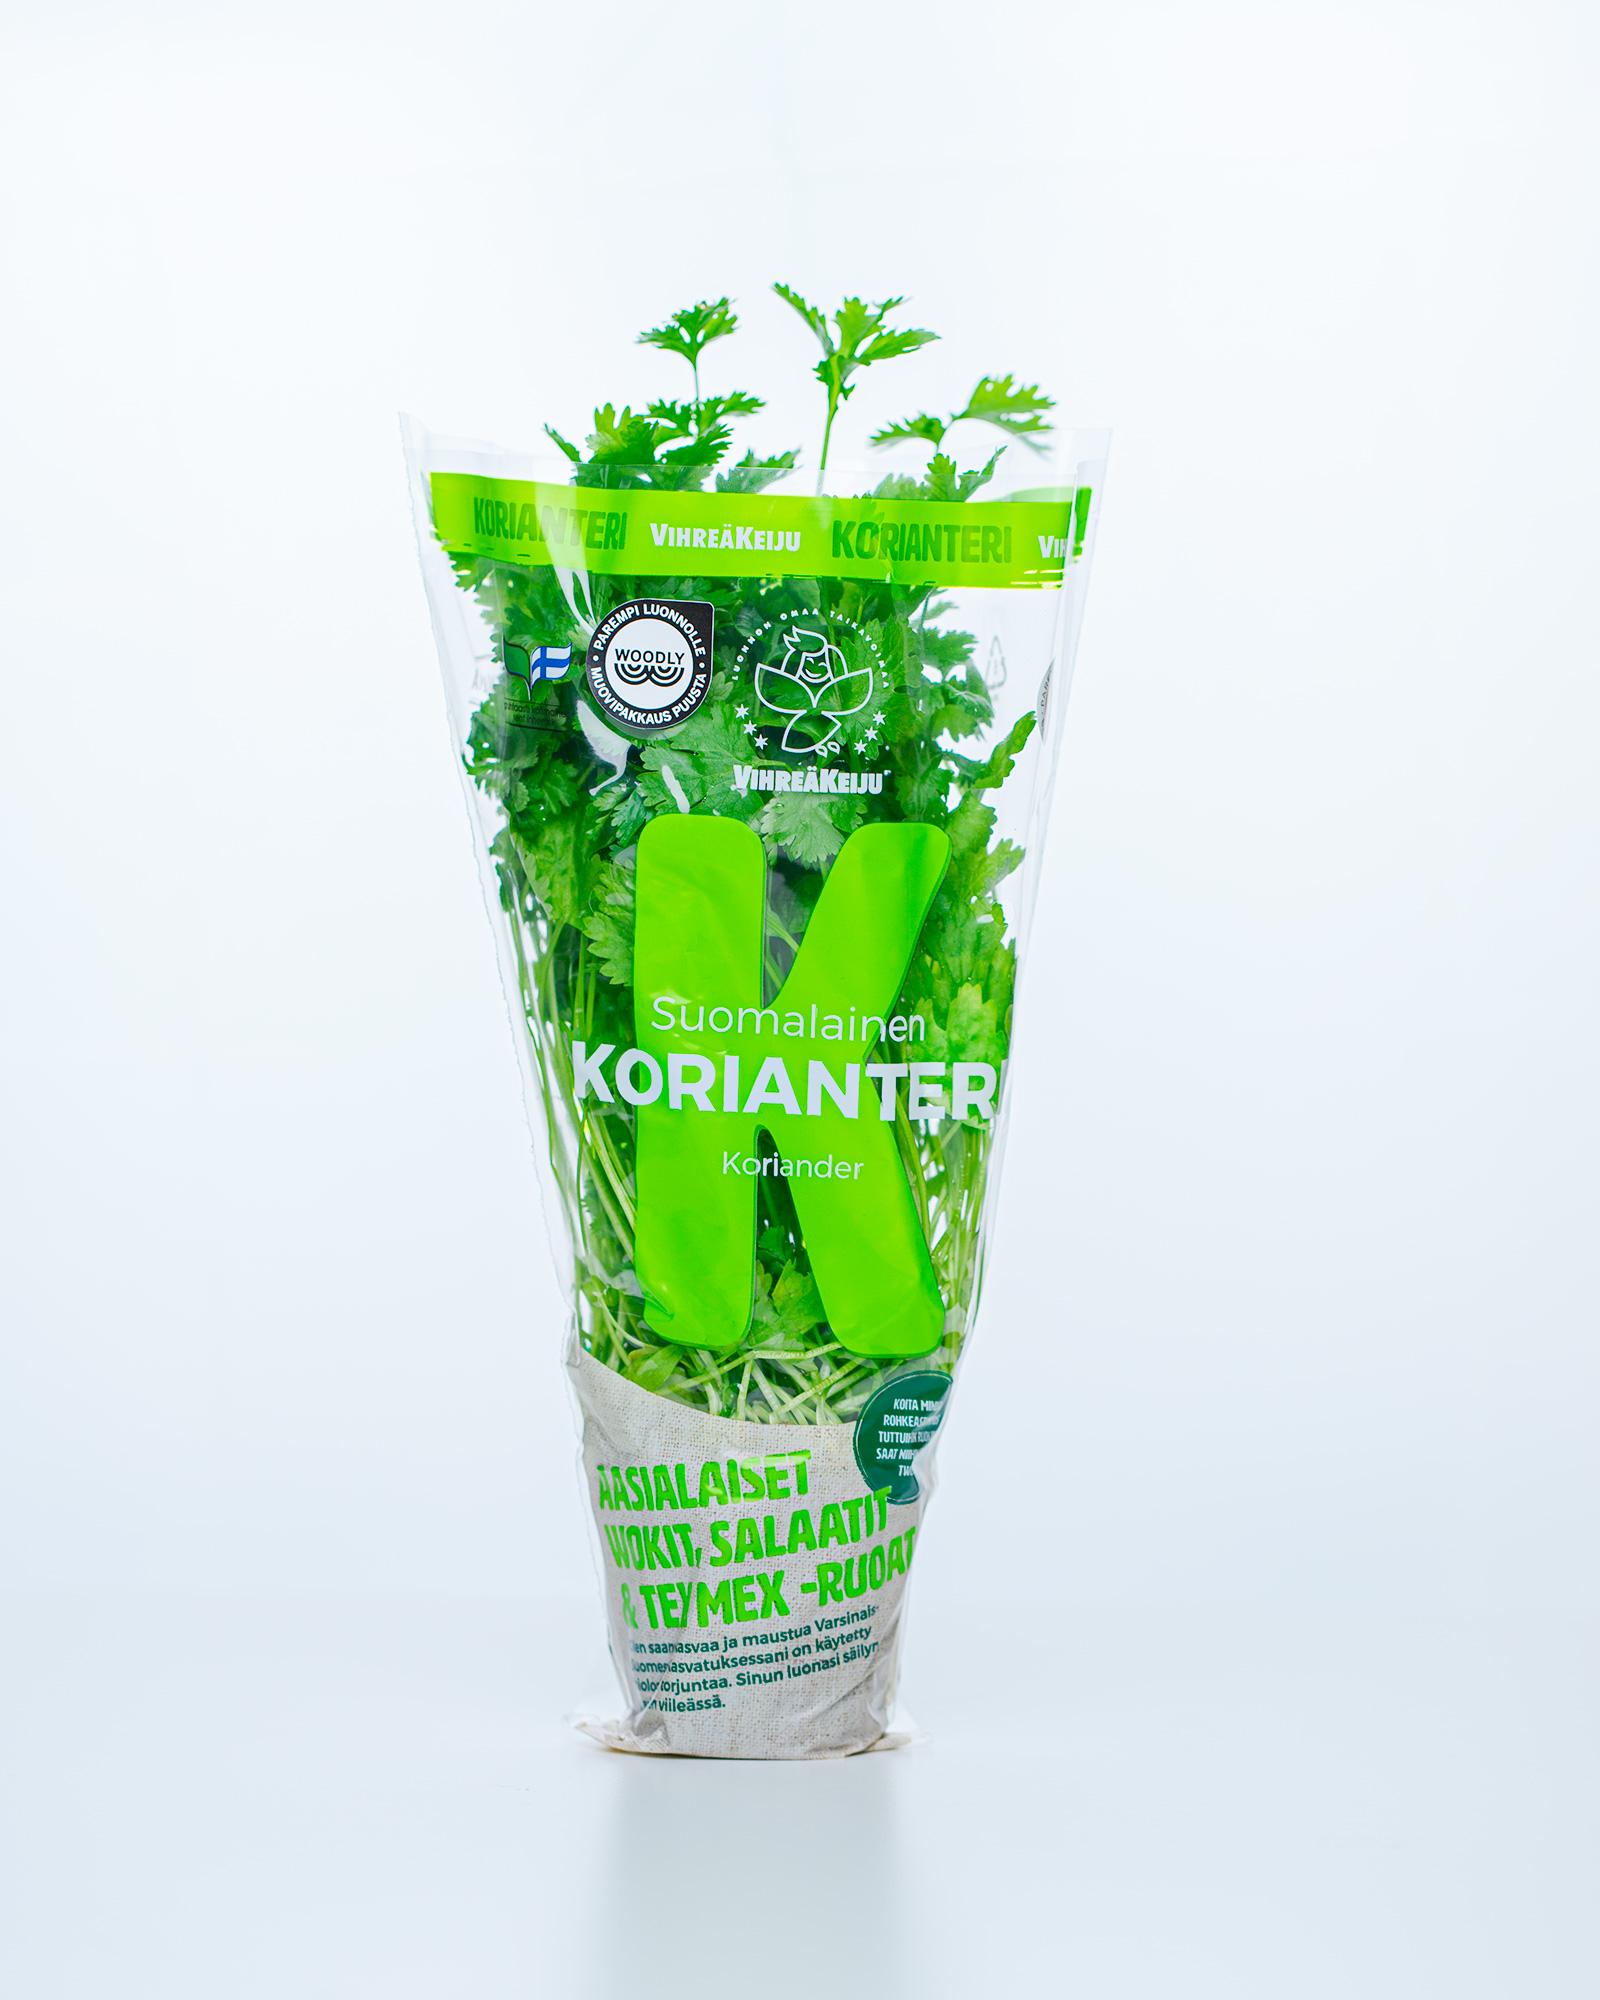 Salad pouch